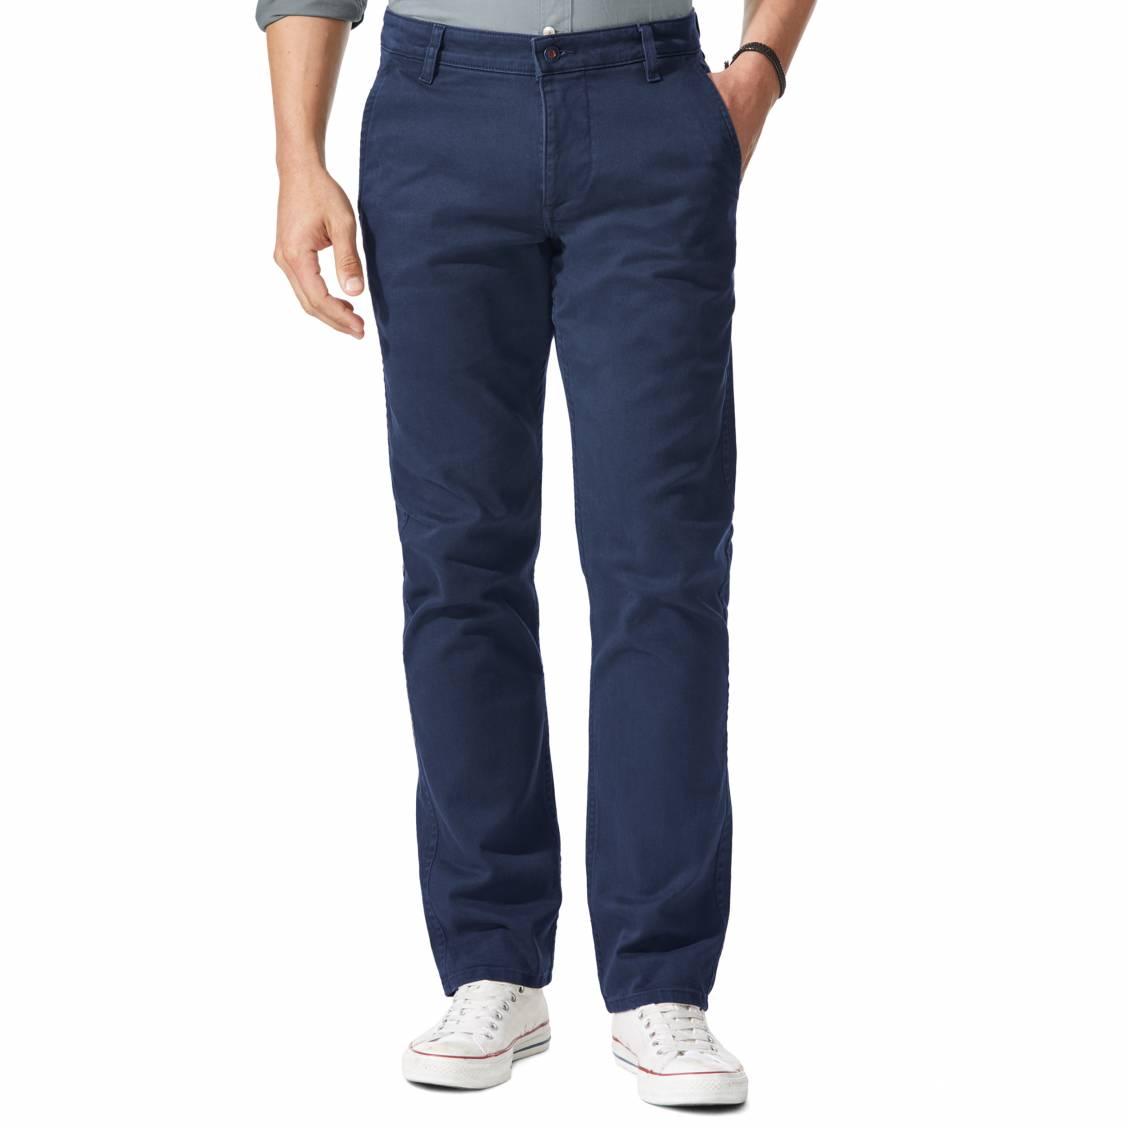 Pantalon Alpha Khaki Original Slim Tapered Dockers en twill bleu marine ...